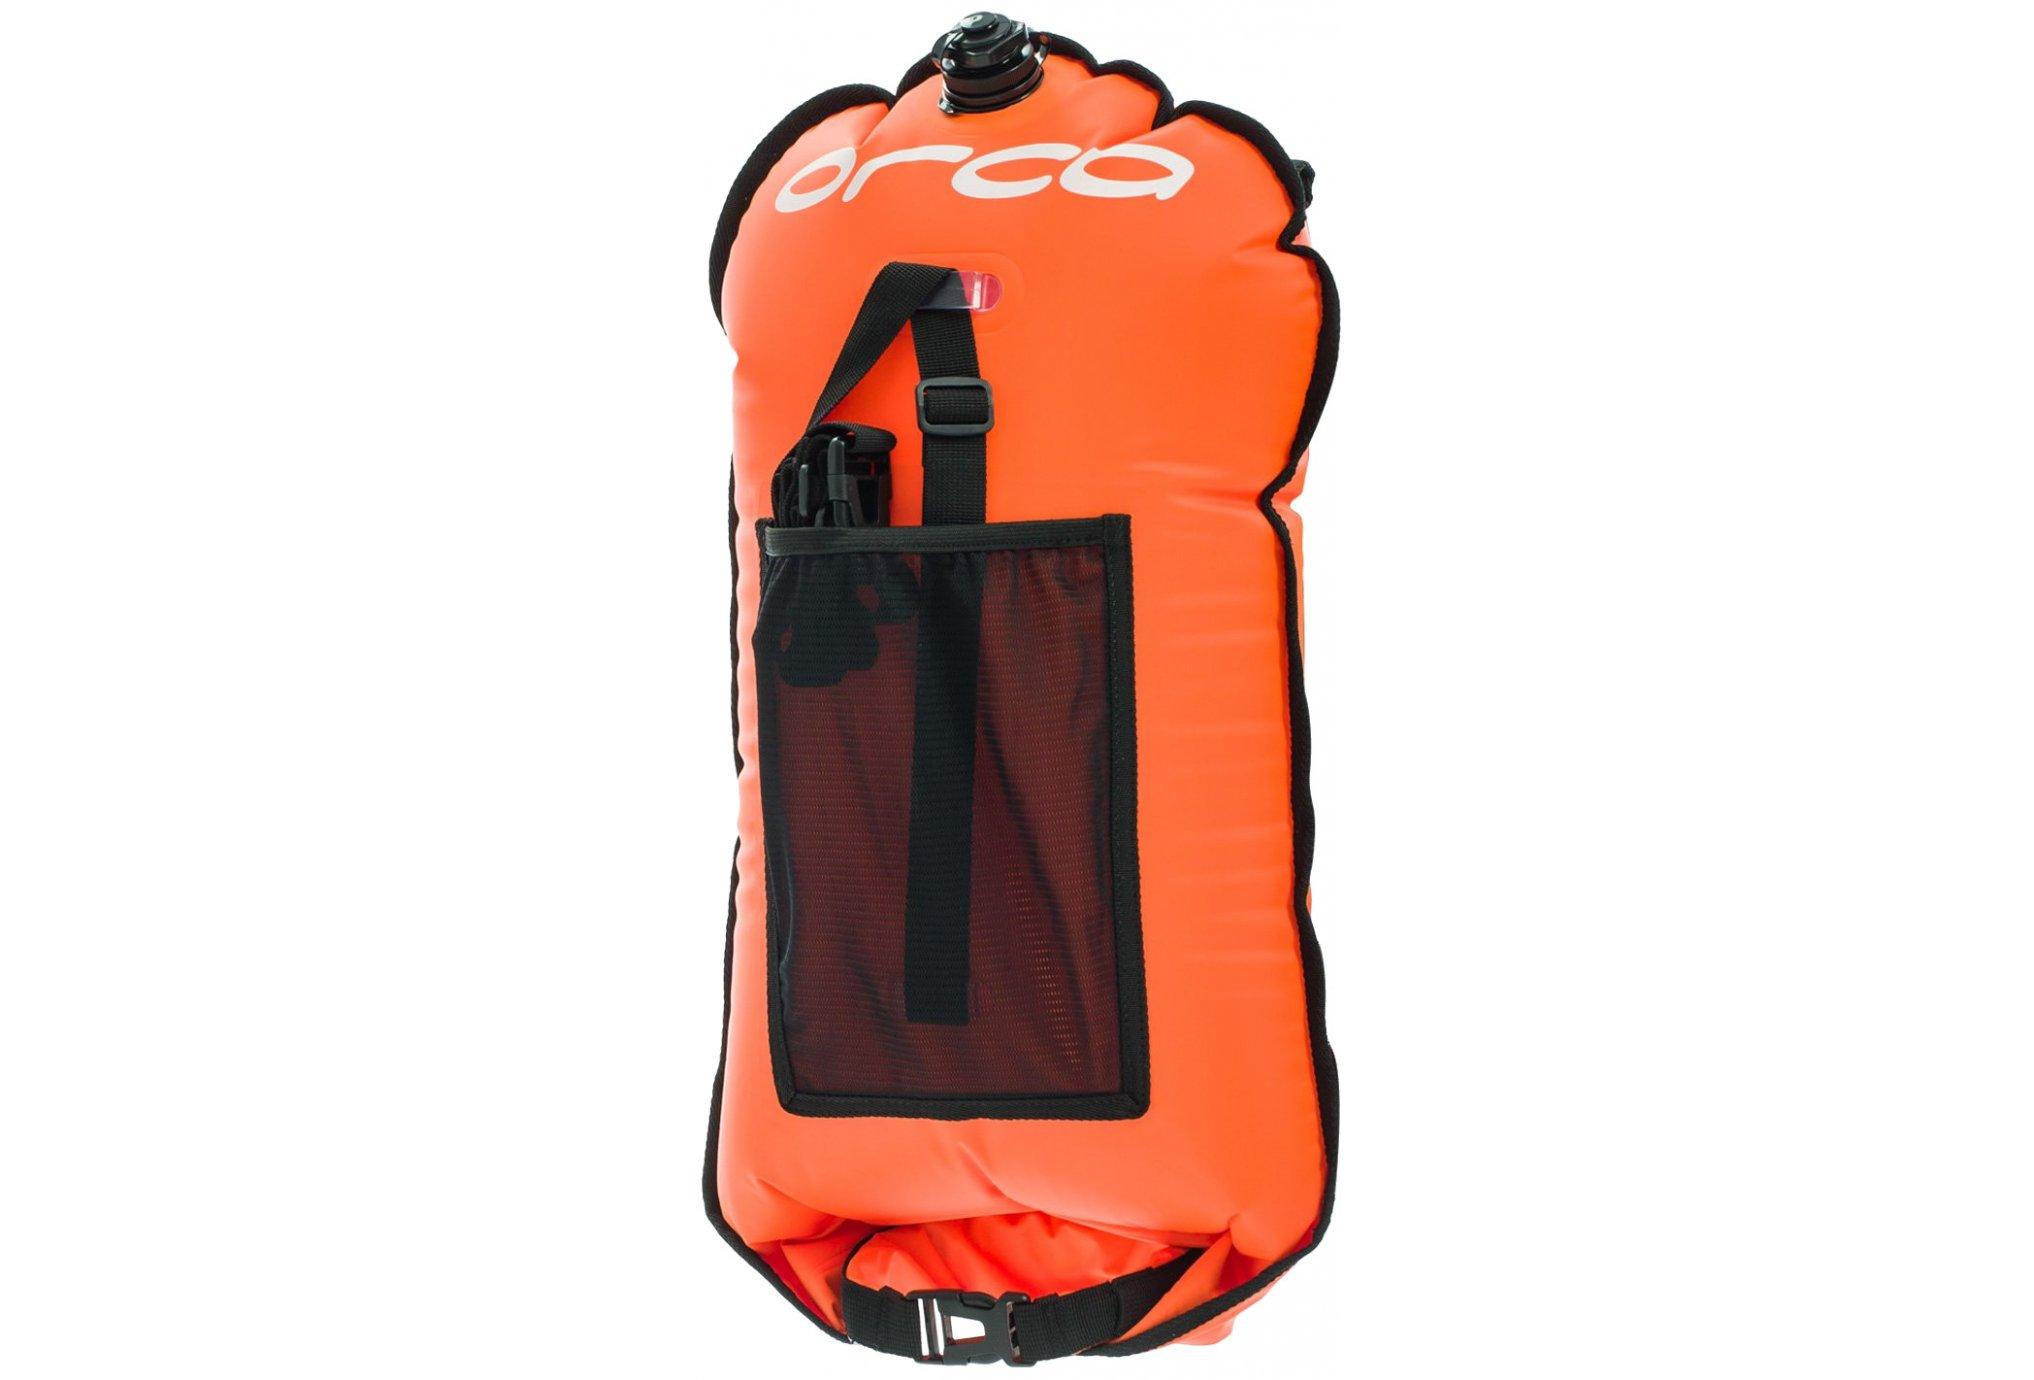 Orca Safety Bag Triathlon-Natation